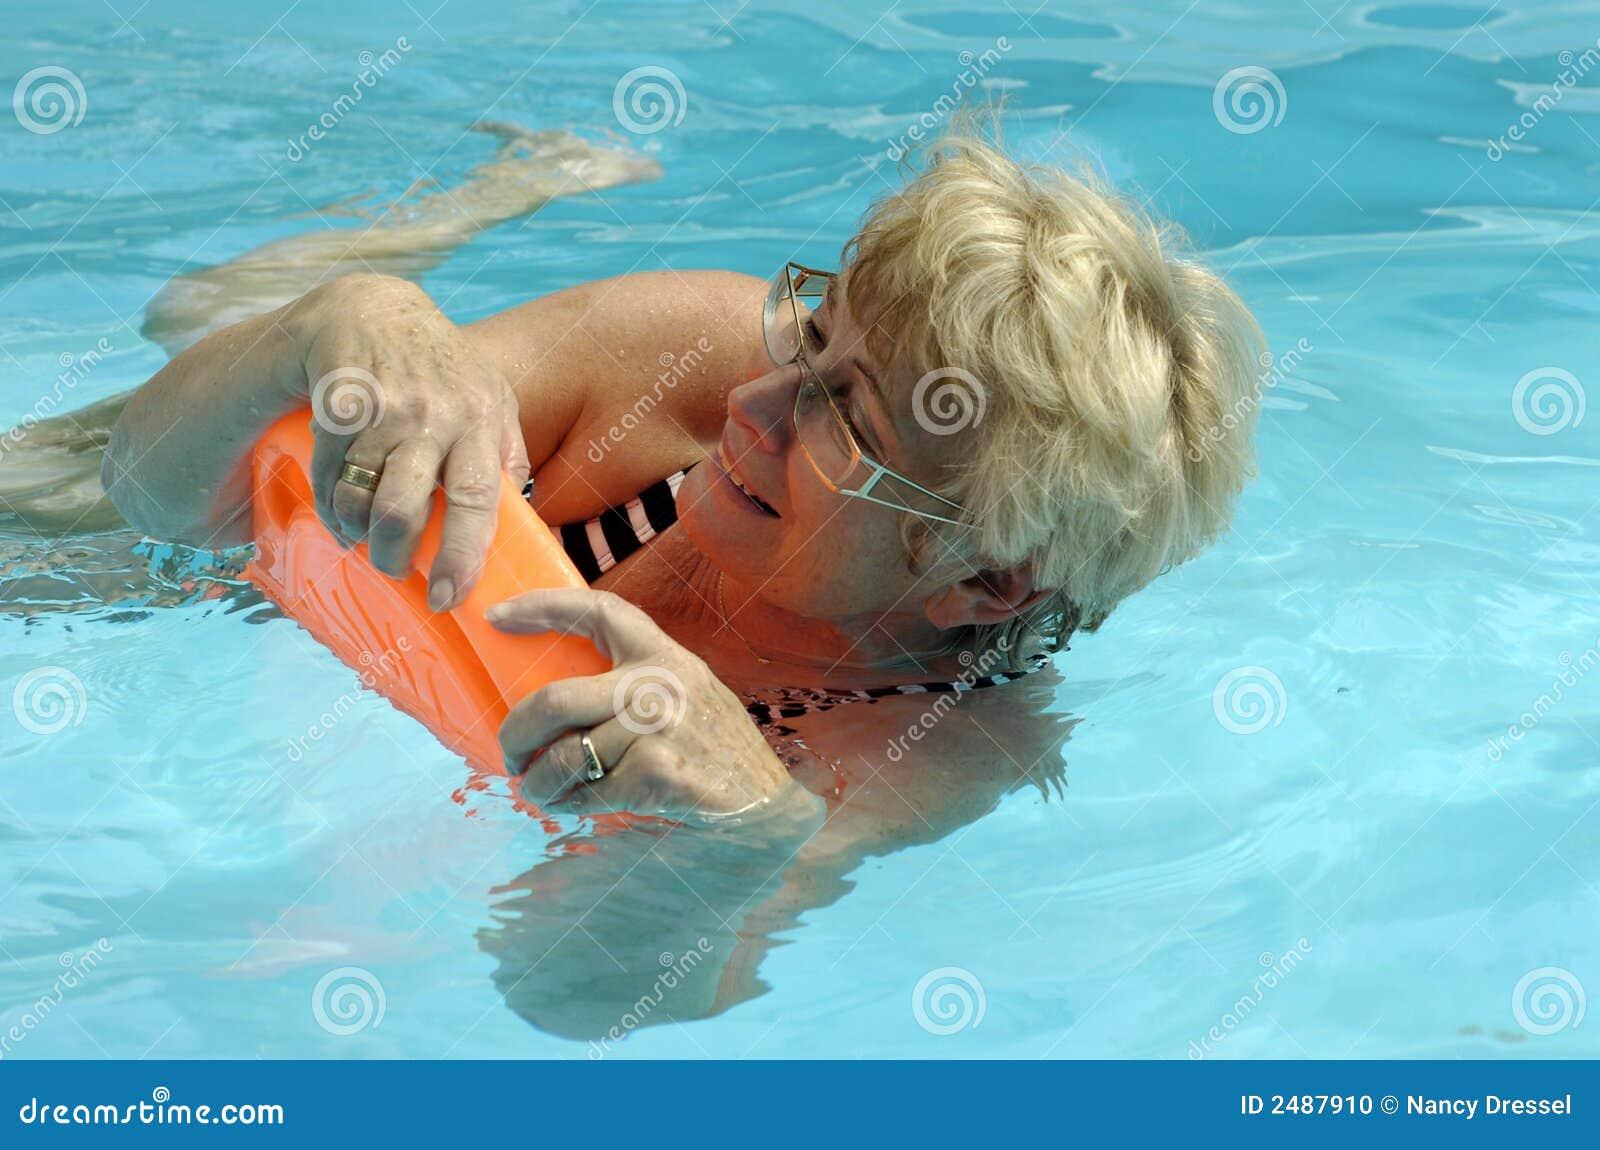 Senior woman in pool